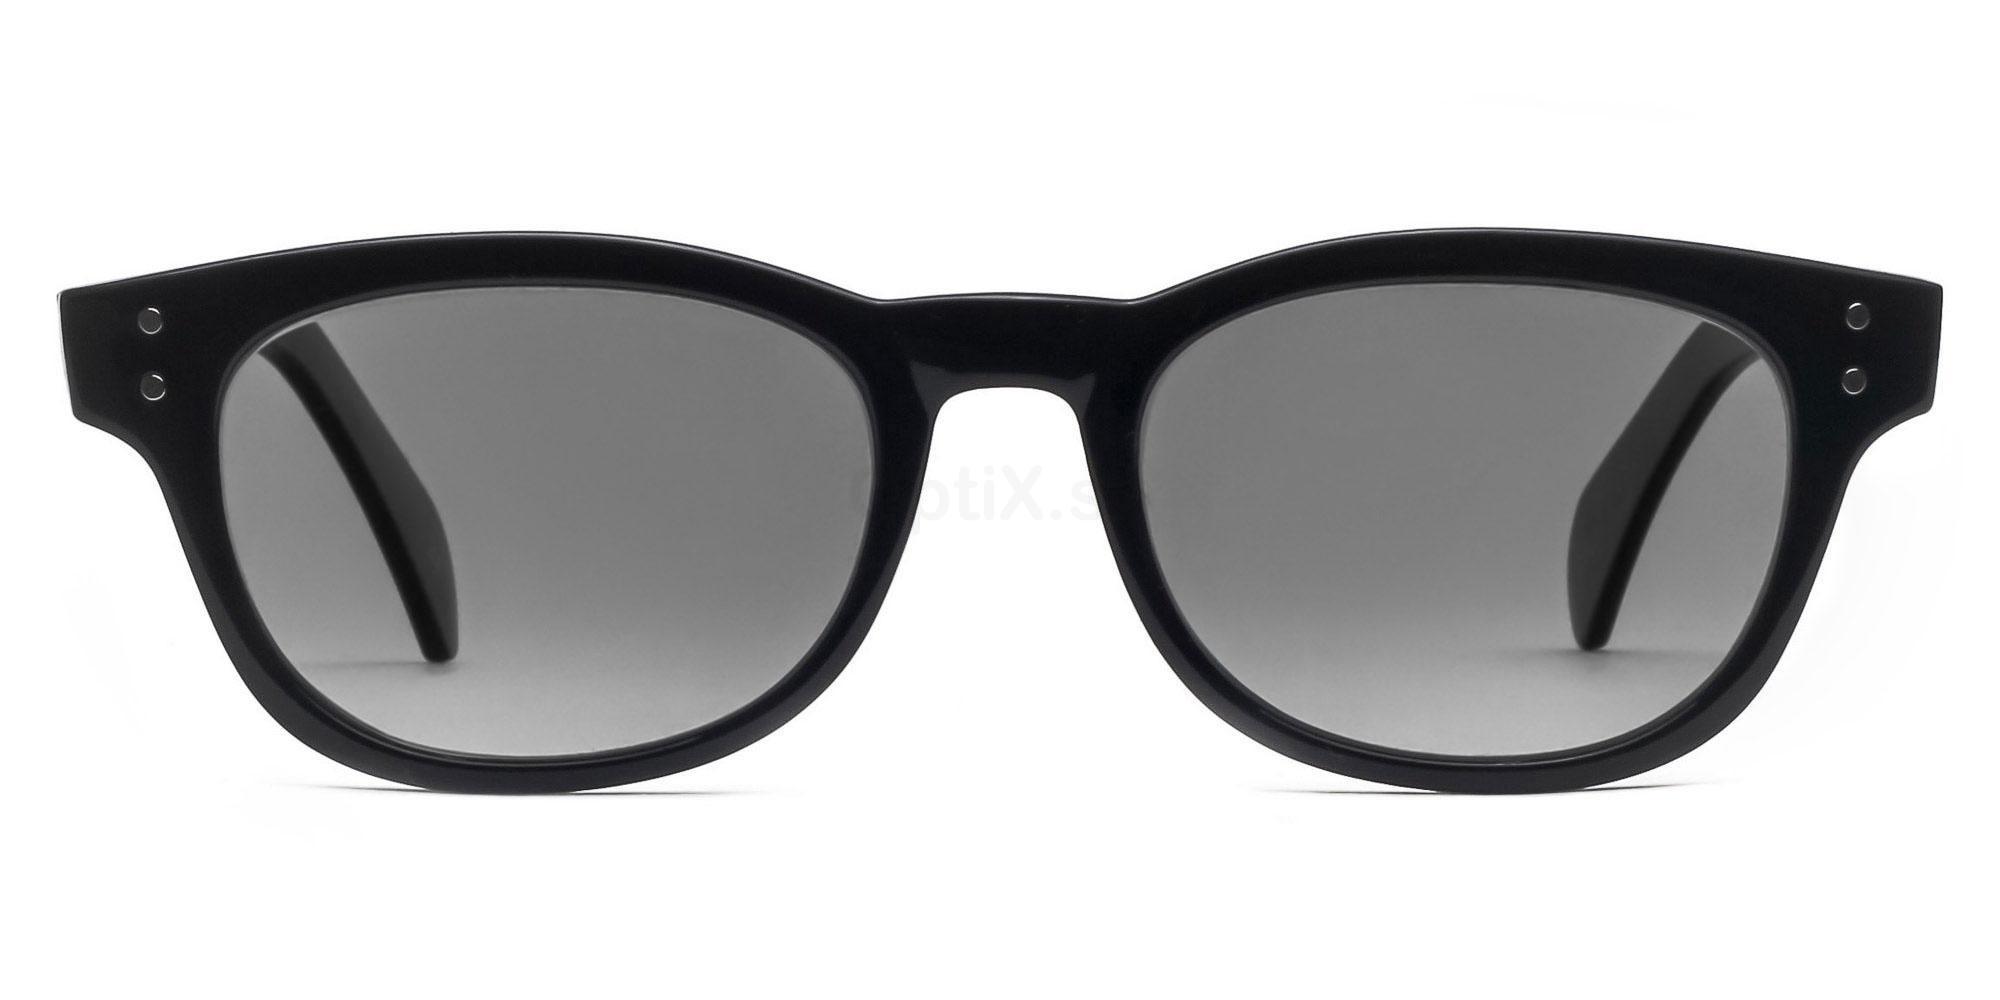 C01 Polarized Grey P2249 Shiny Black (Polarized) Sunglasses, Savannah